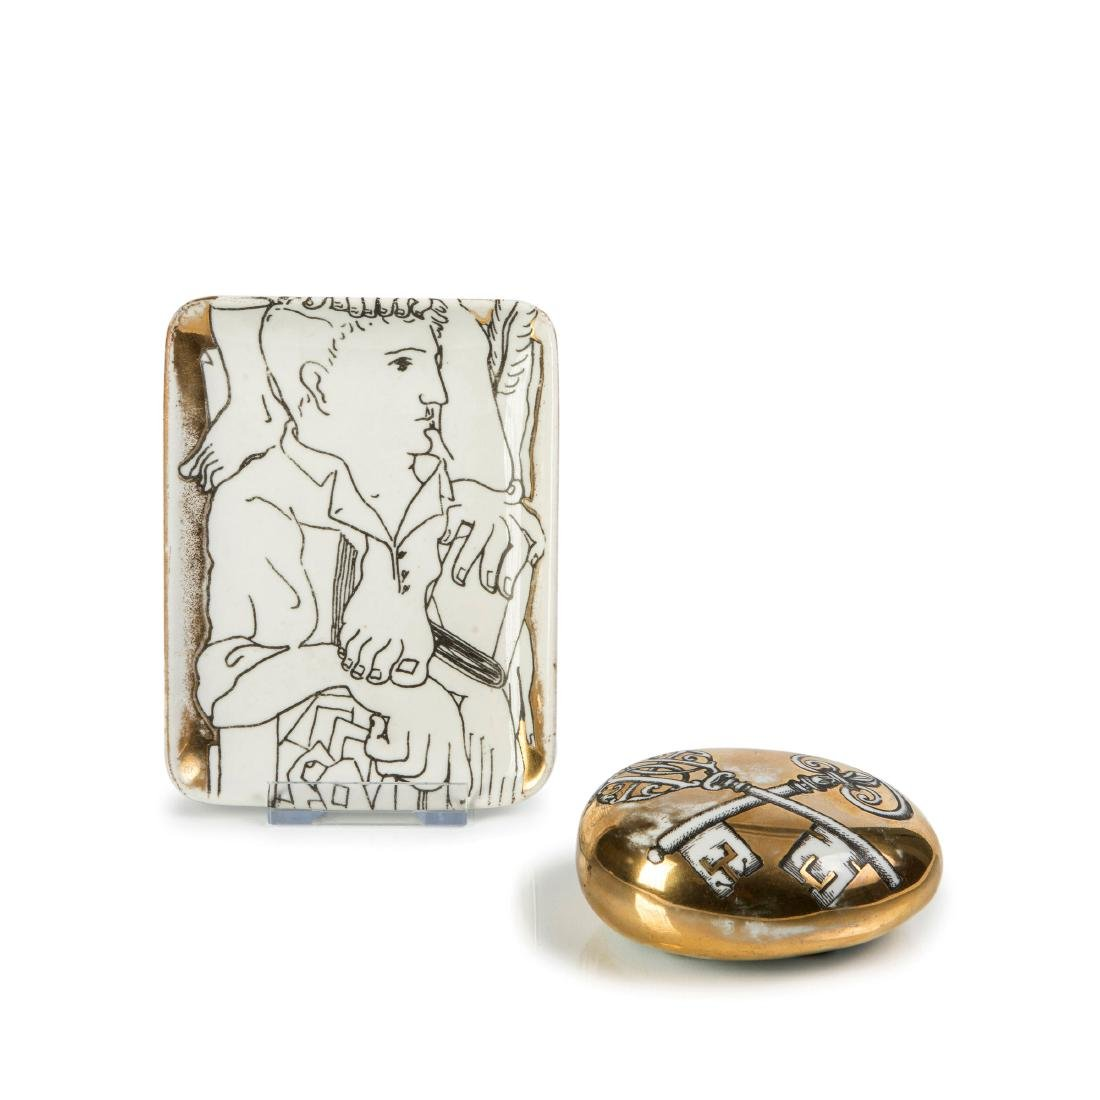 'Uomo' ashtray and 'Chiavi' paperweight, 1950/60s